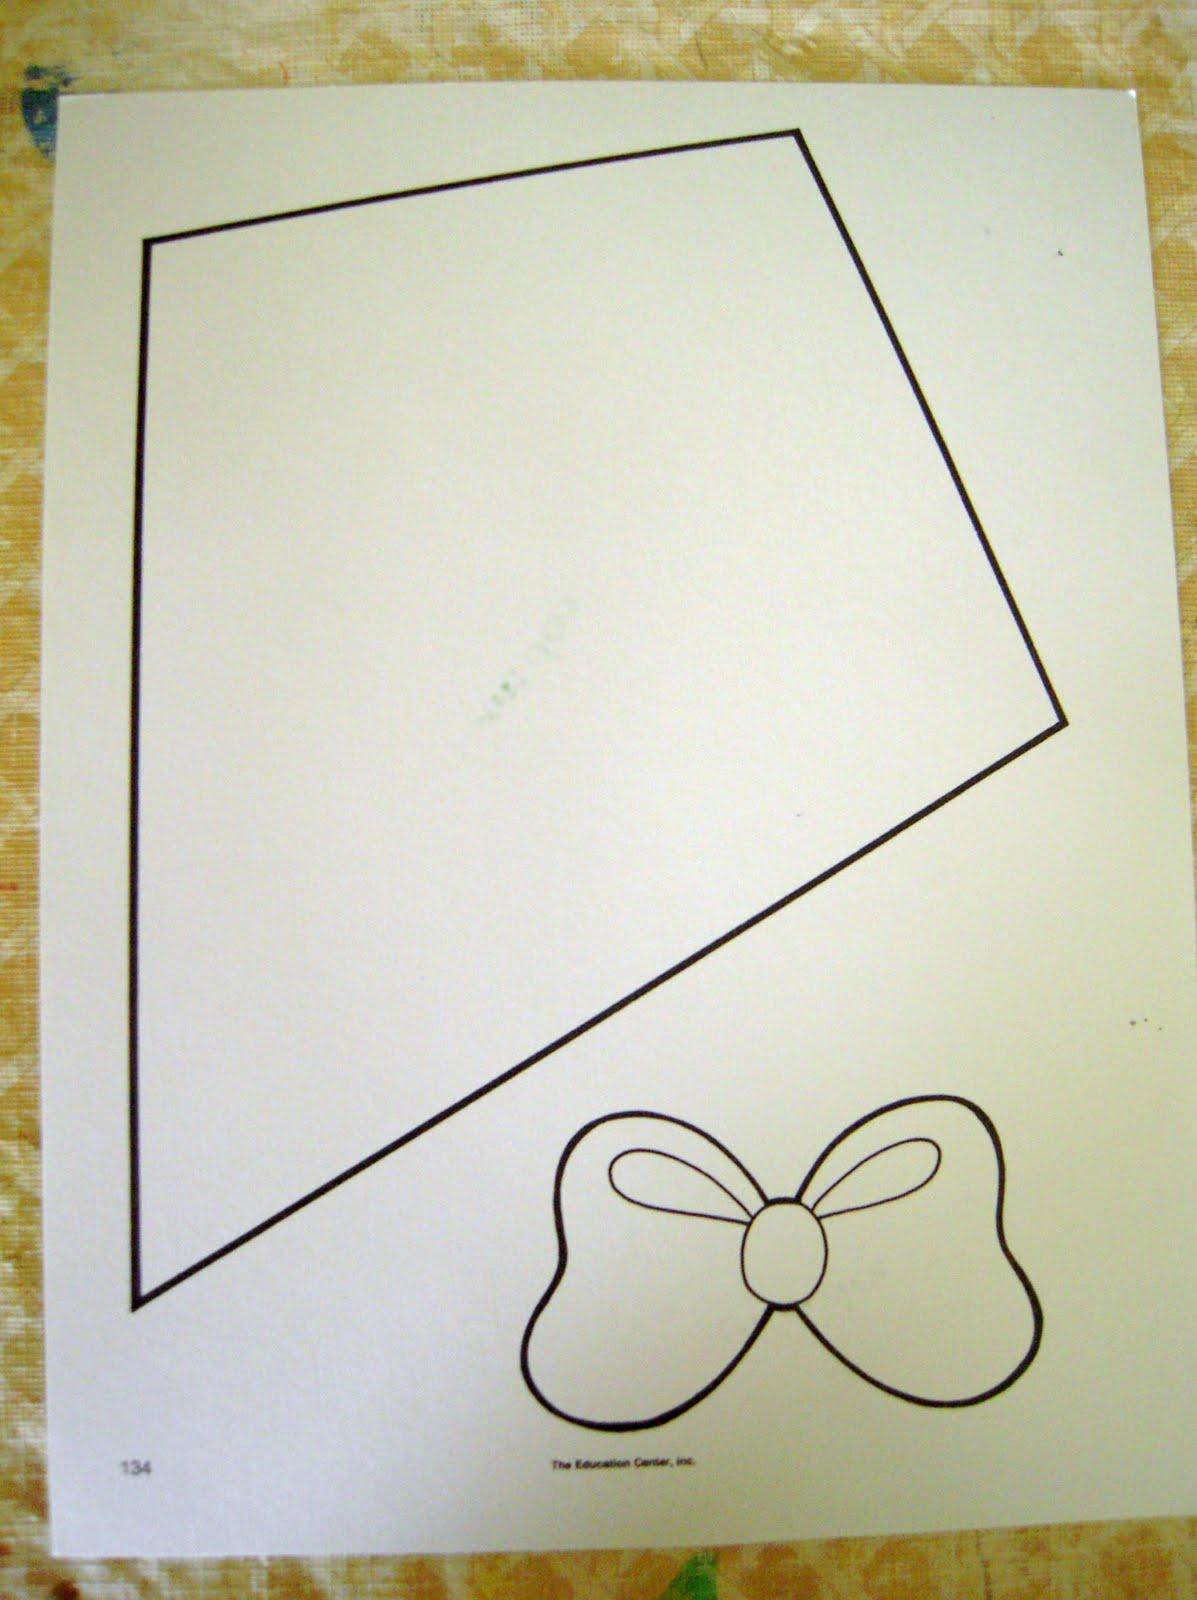 Kite Template For Writing Decorating their kites.